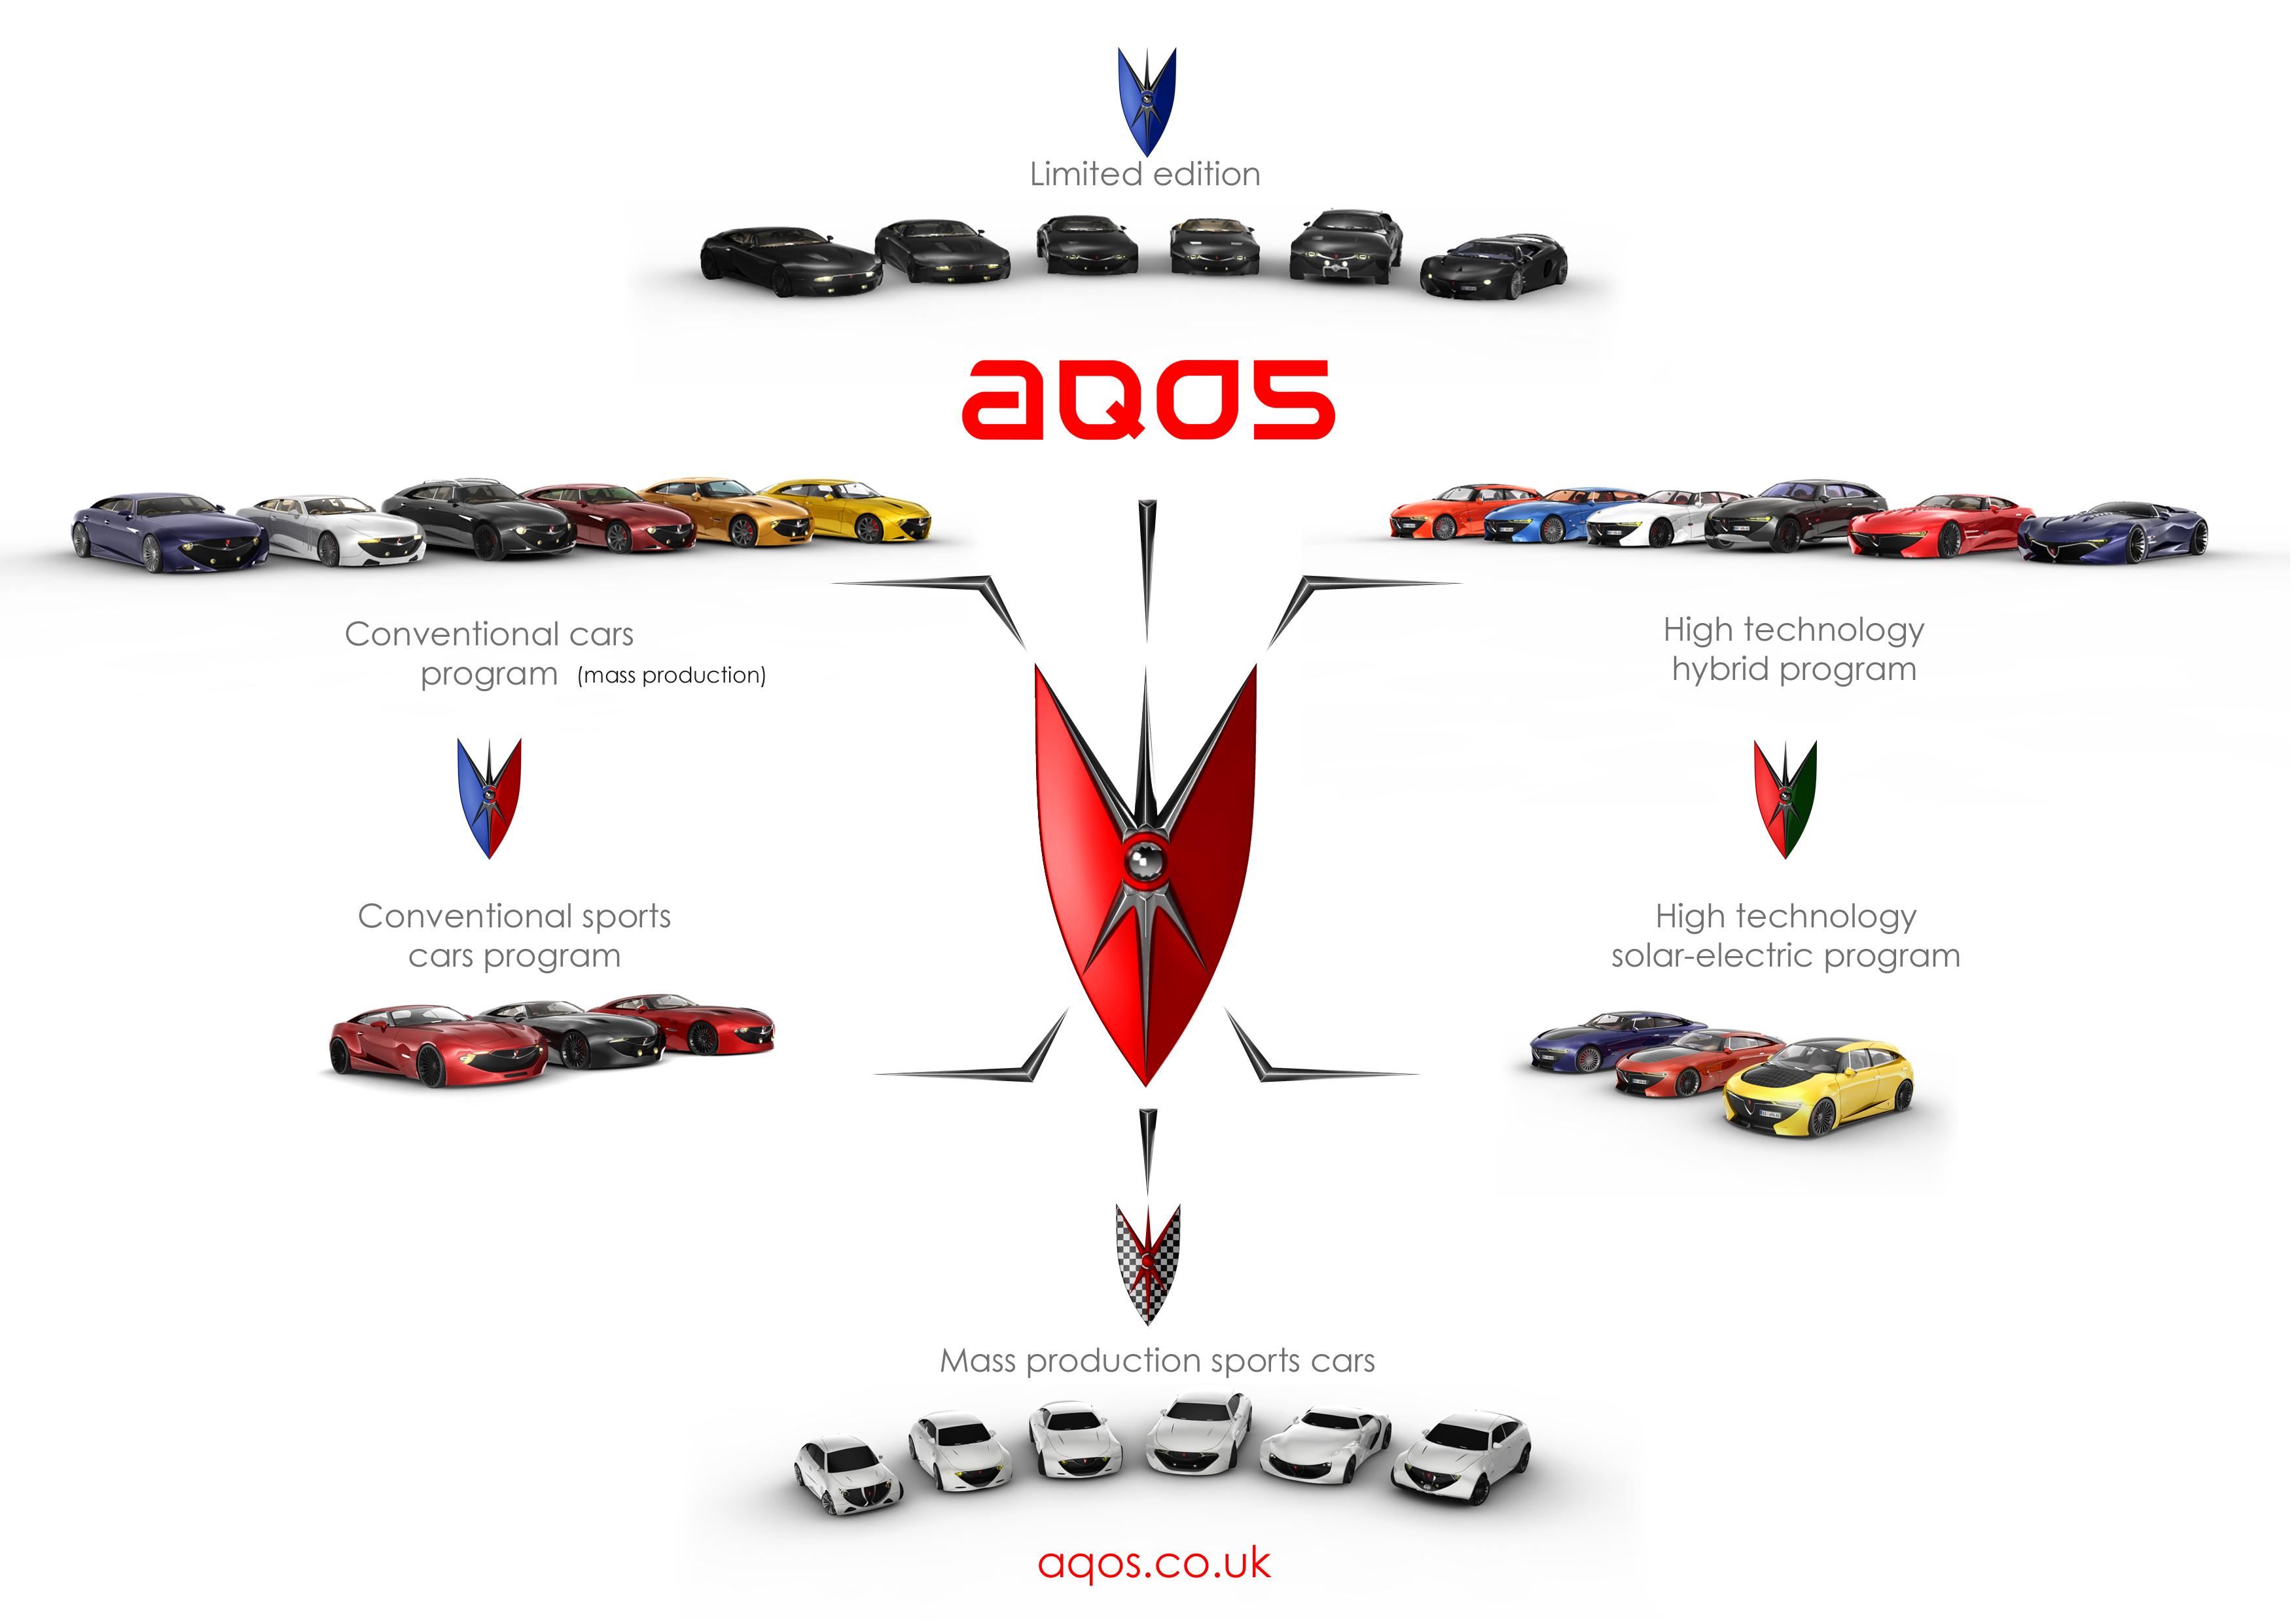 AQOS – The Brand